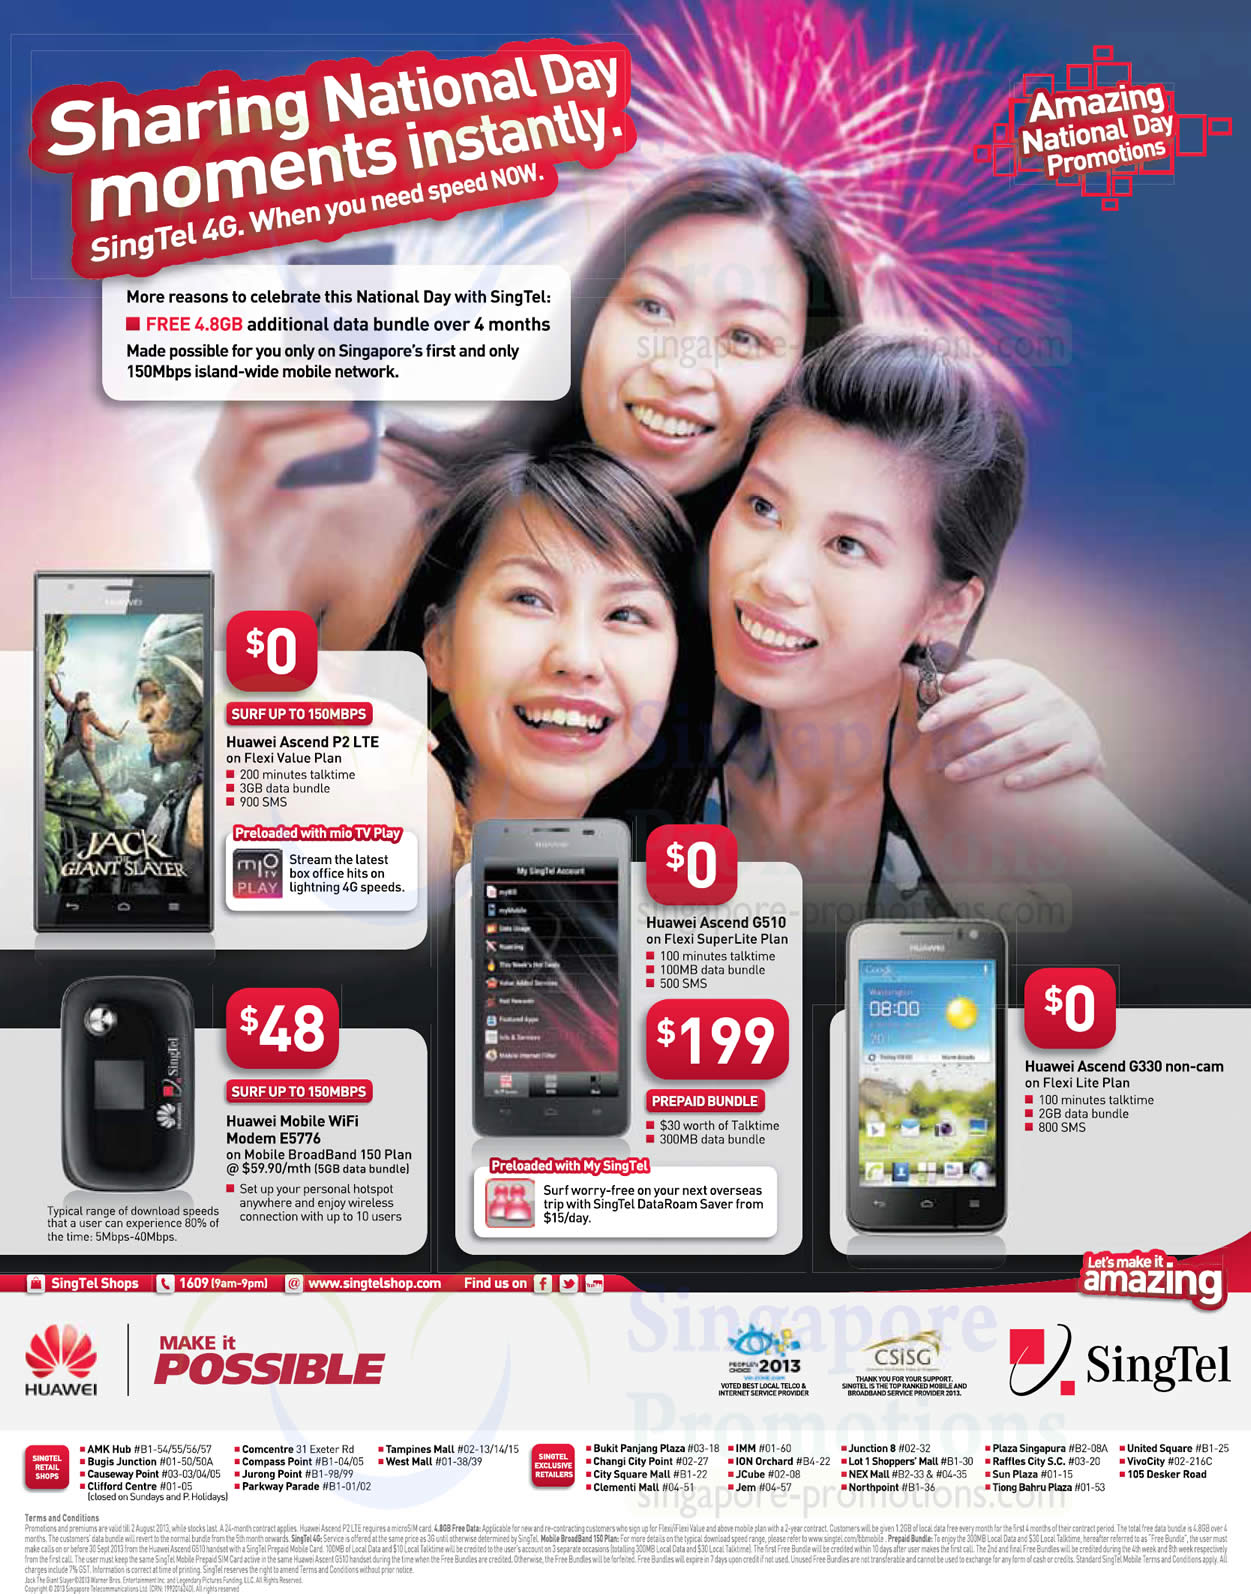 Huawei Ascend P2 LTE, Huawei Ascend G510, Huawei Ascend G330